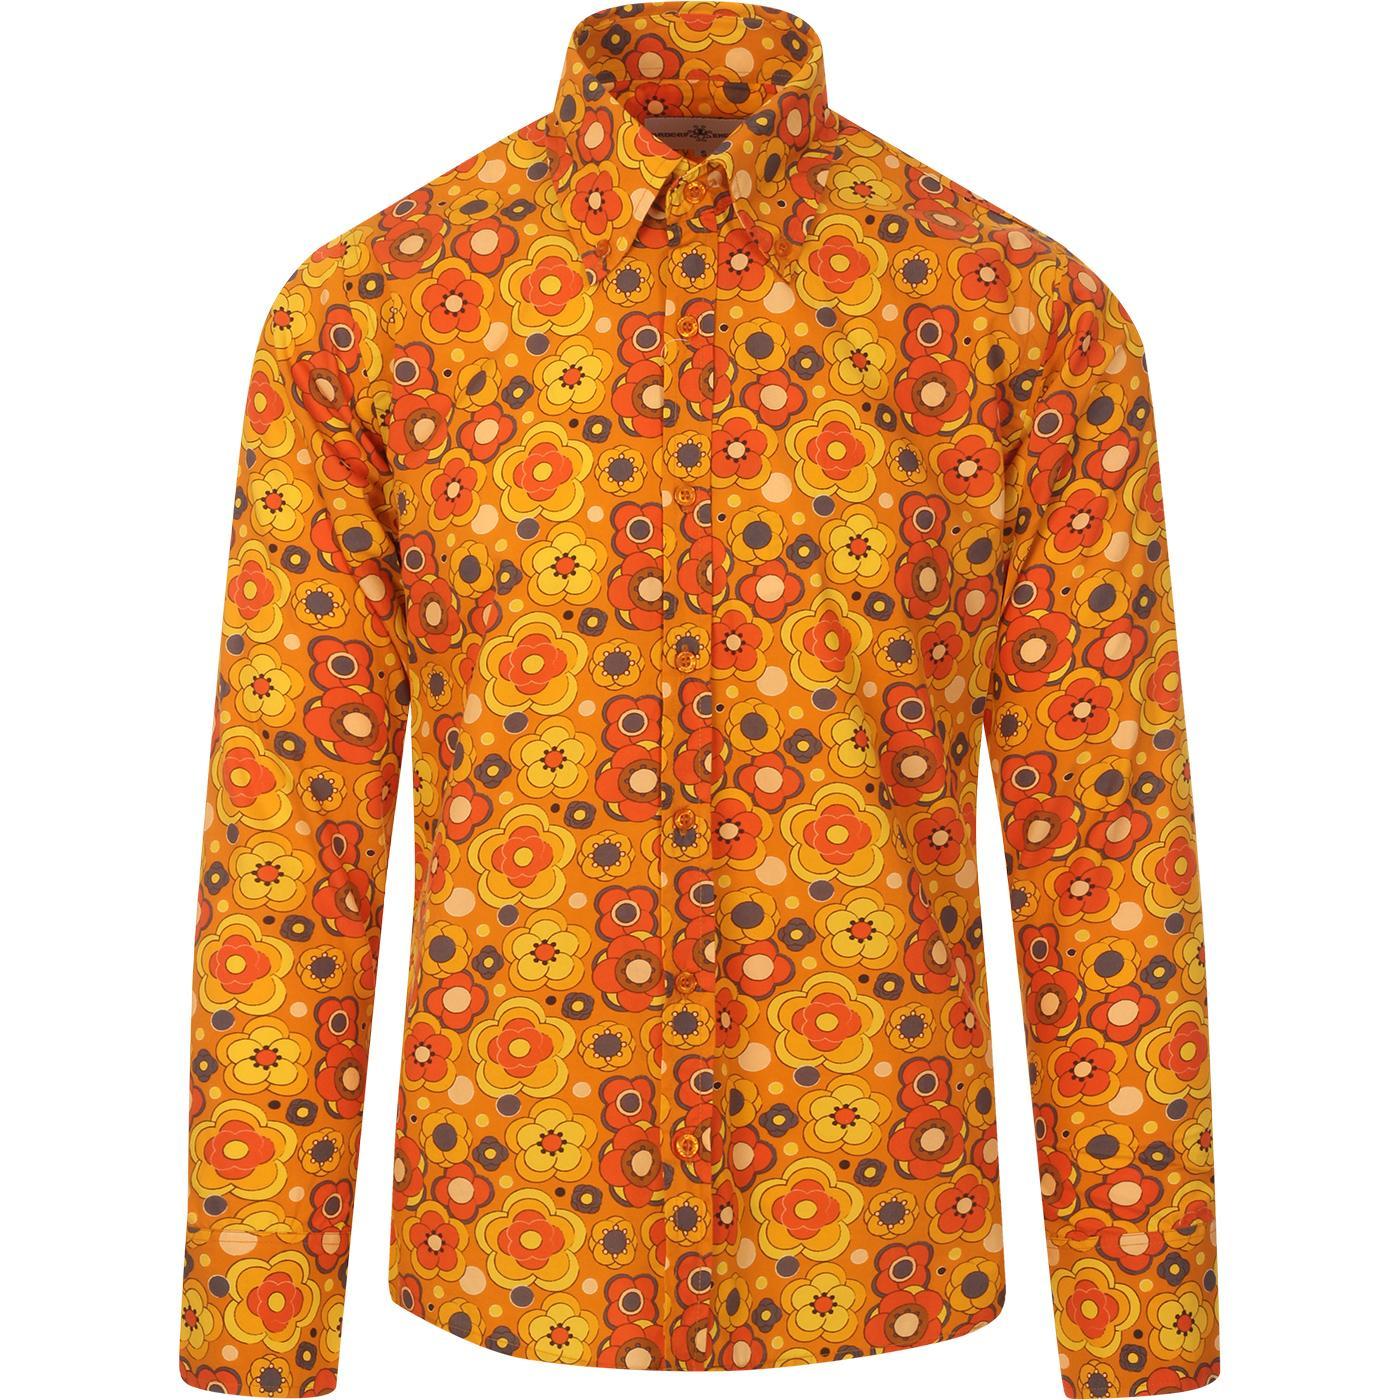 madcap england mens trip retro bold floral print long sleeve shirt yellow orange